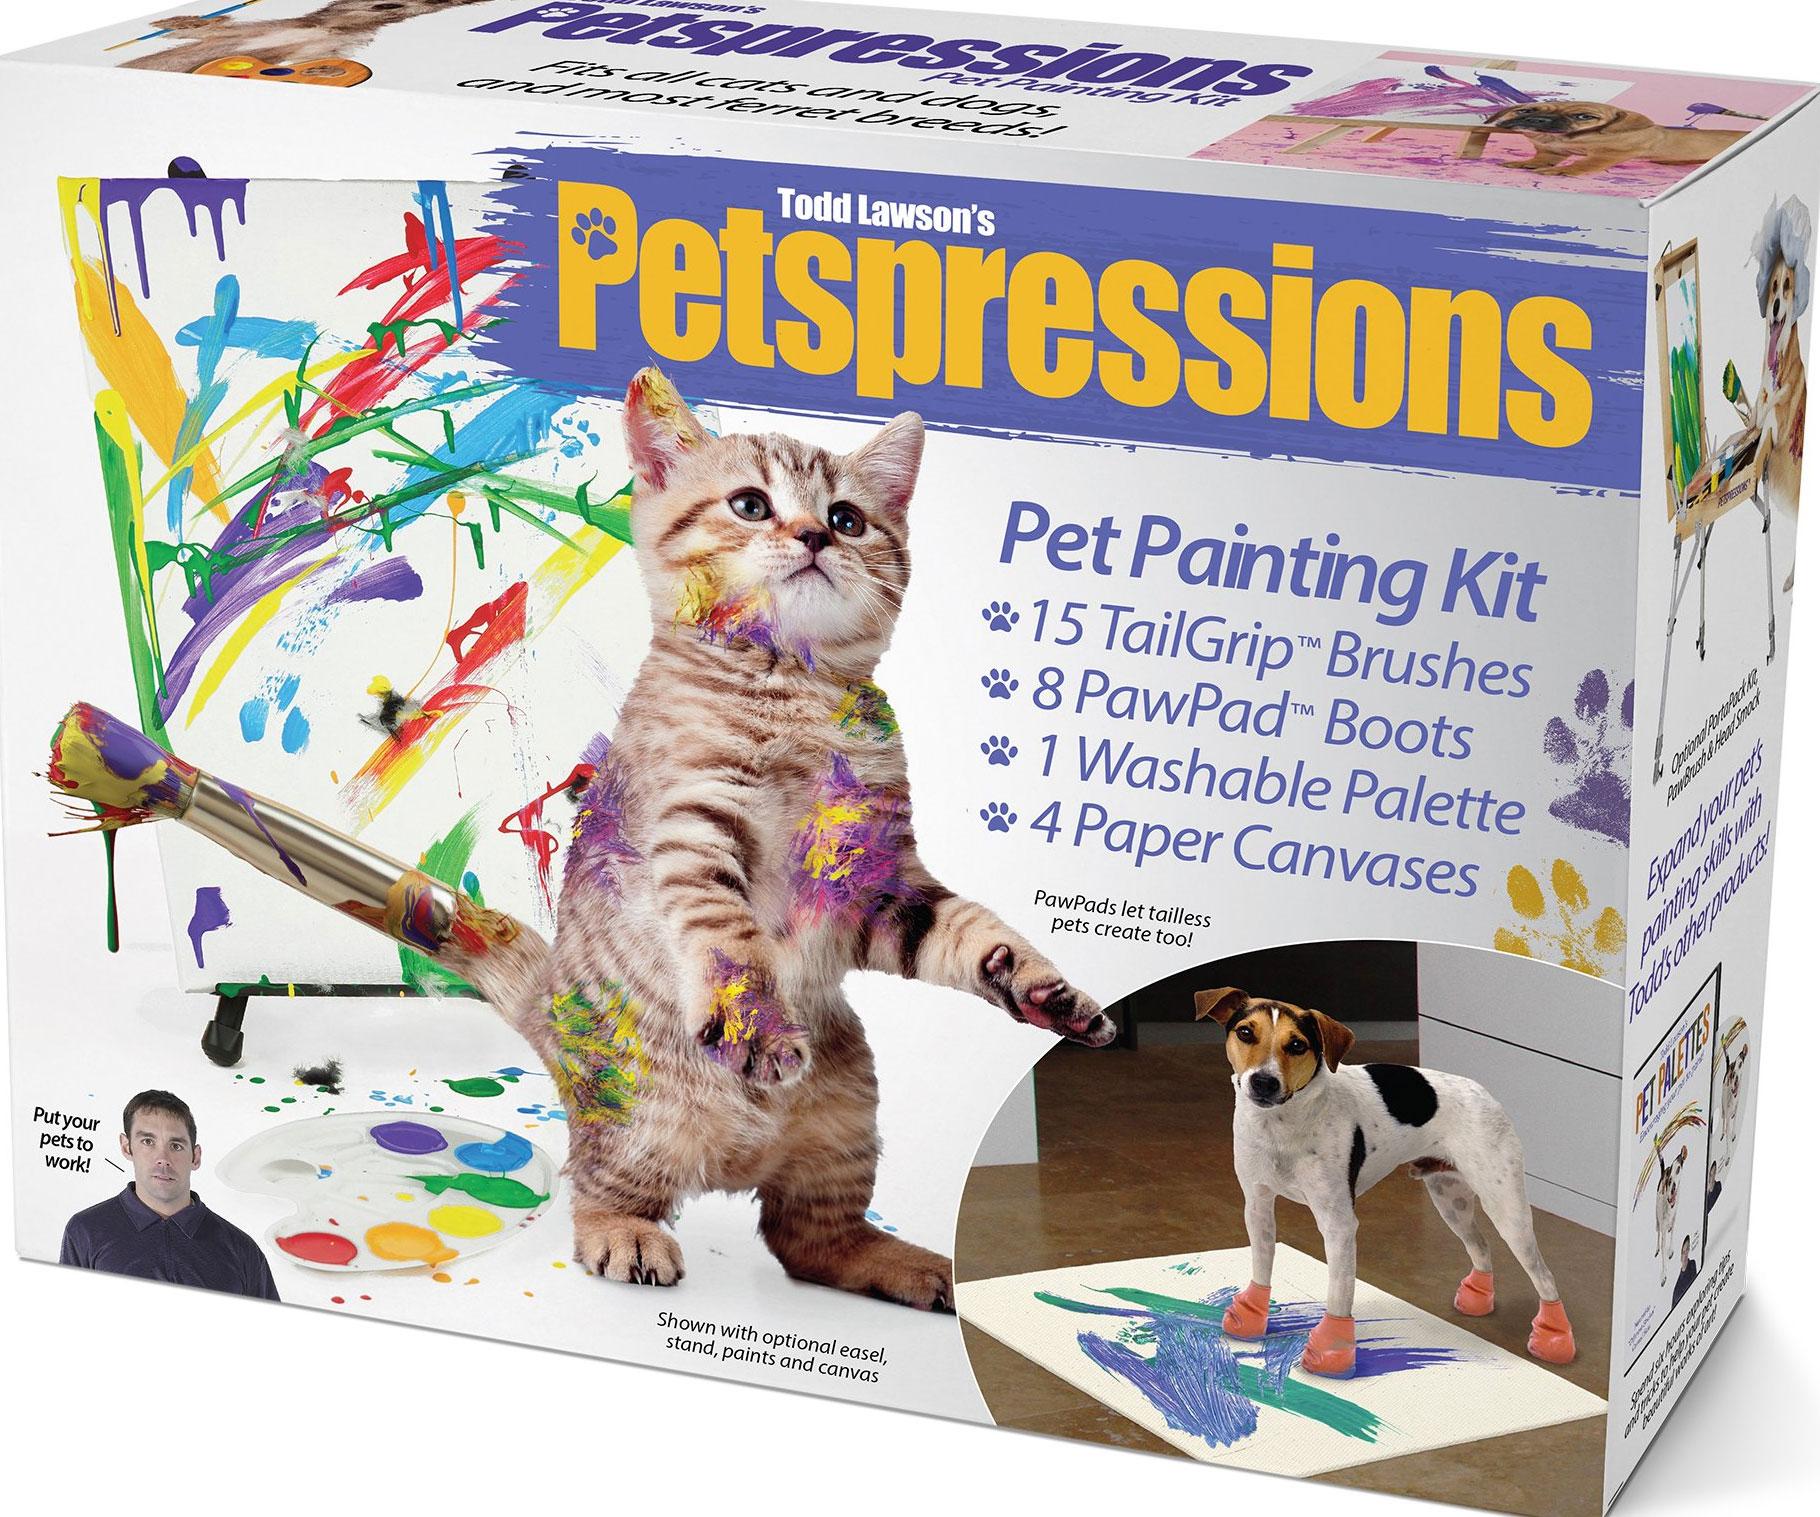 Petspressions Pet Painting Kit